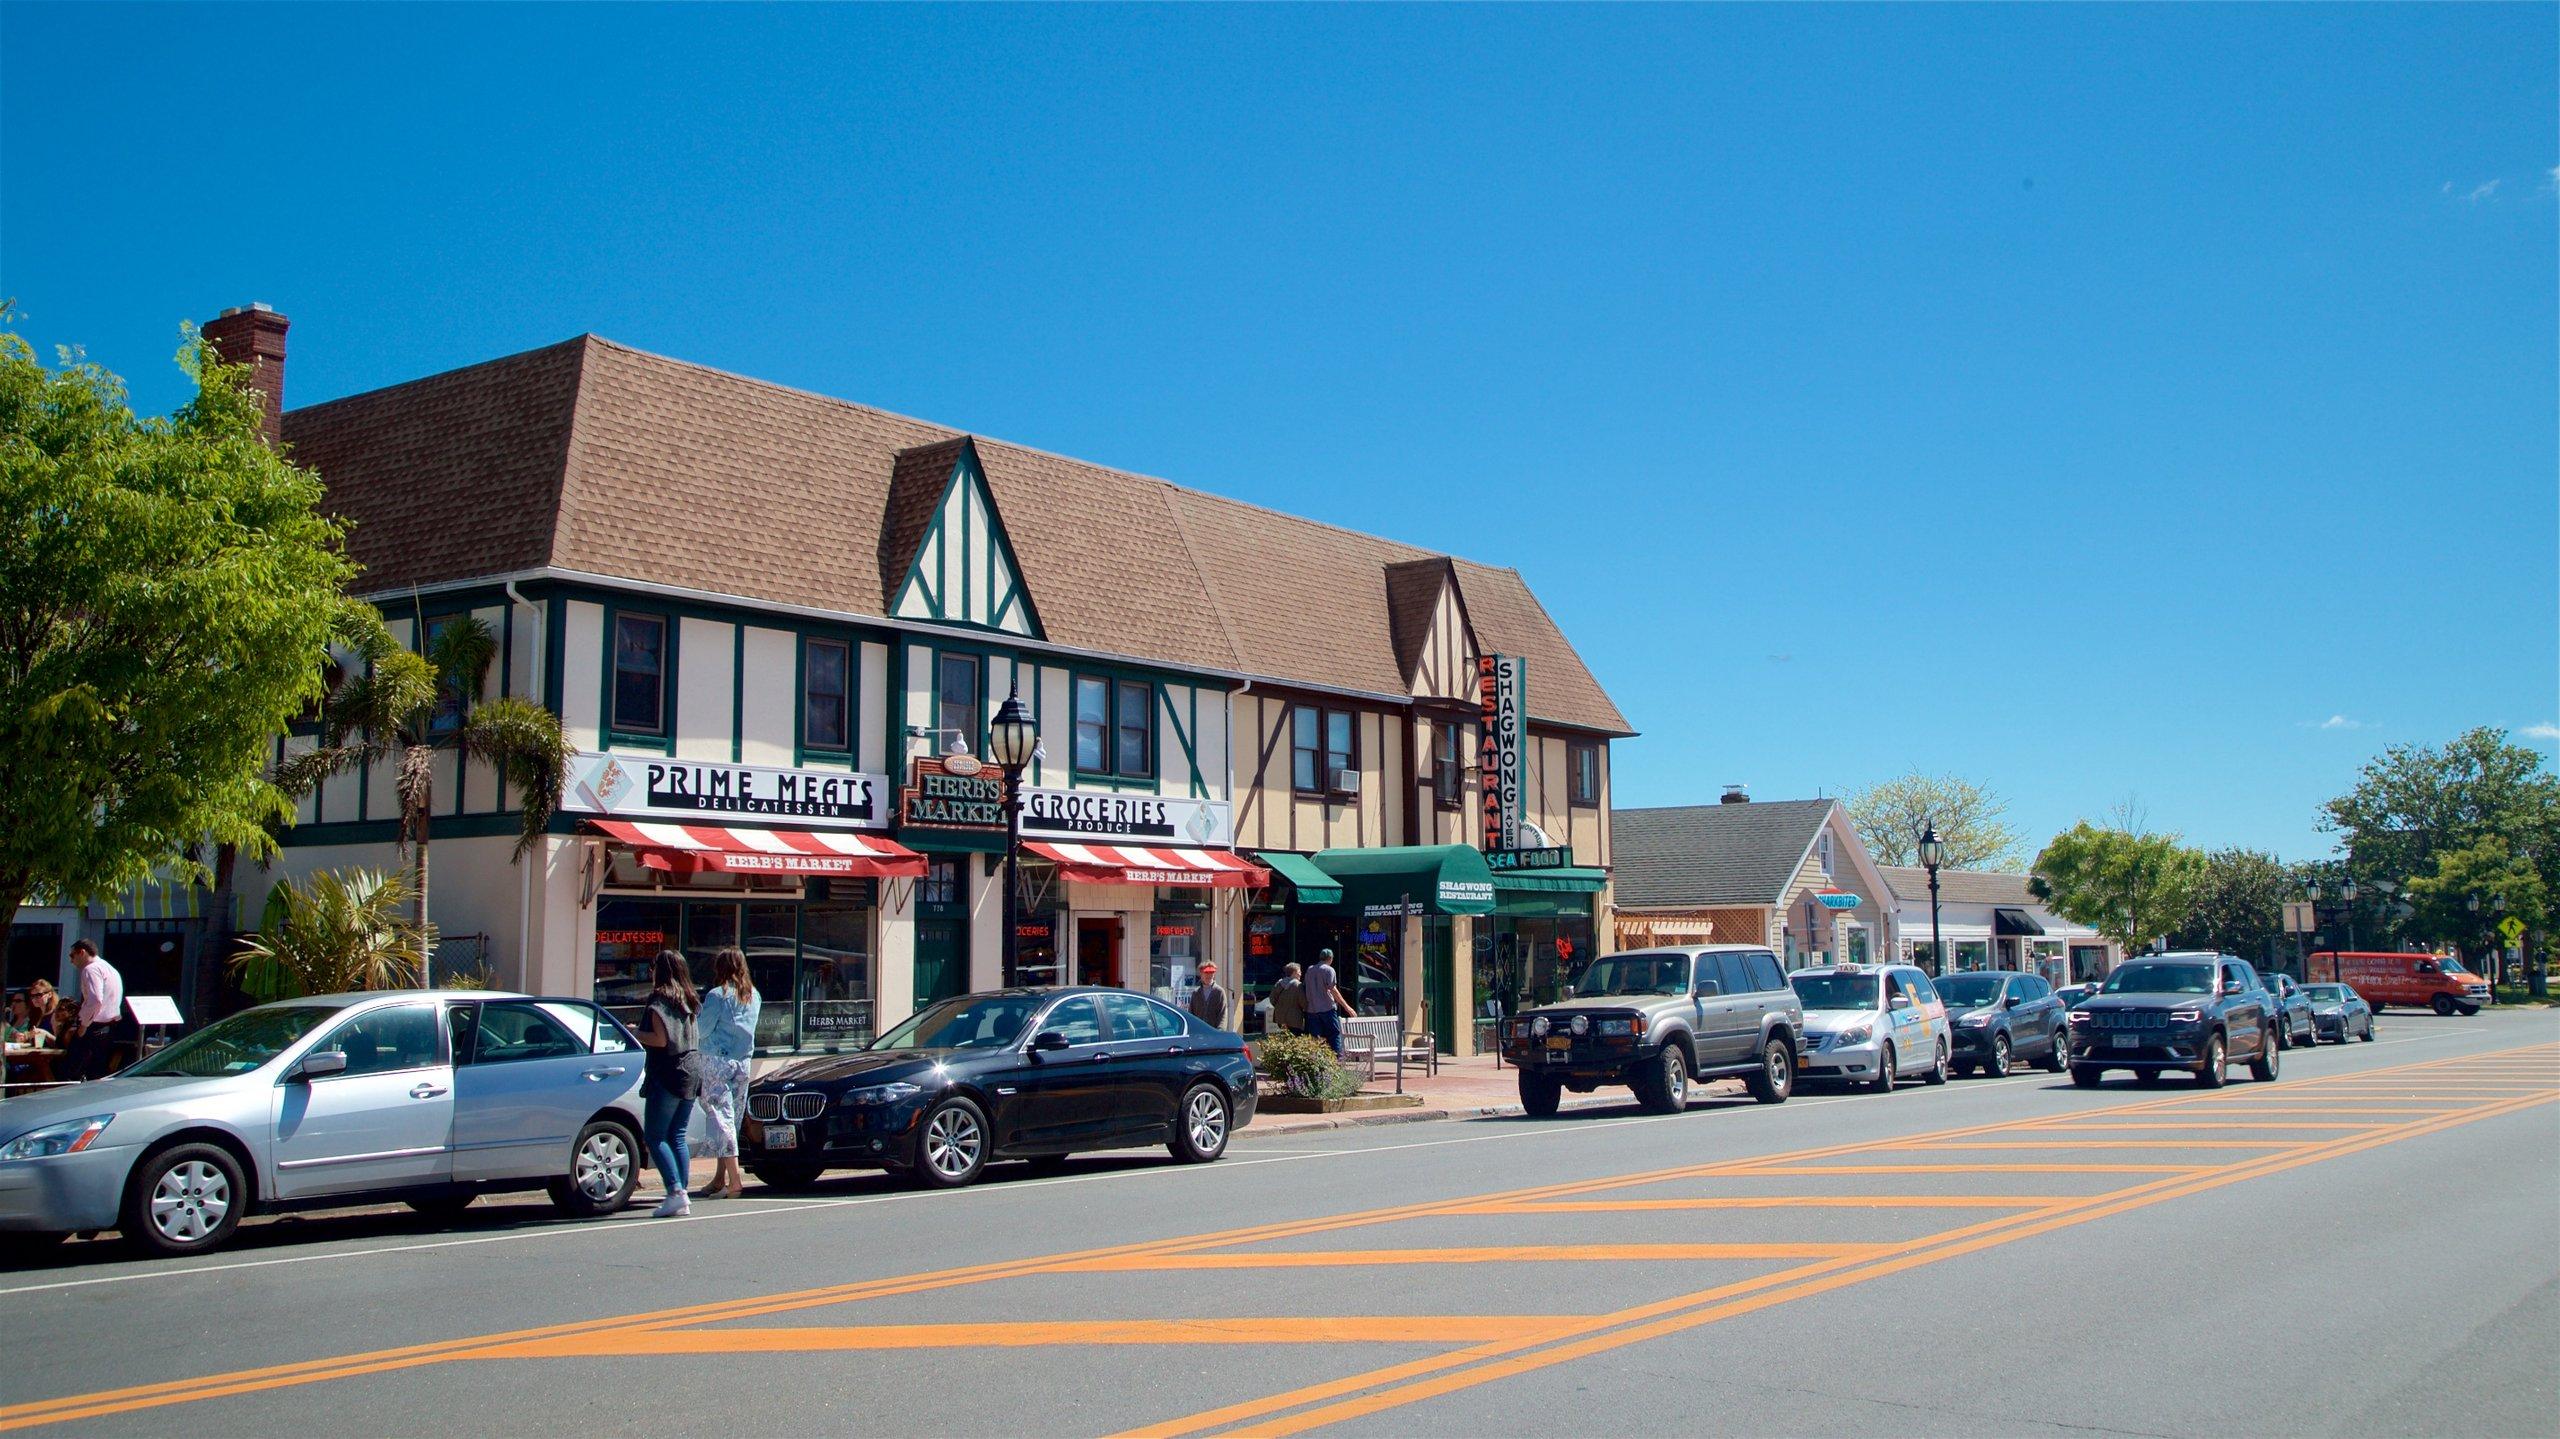 Montauk, New York, United States of America